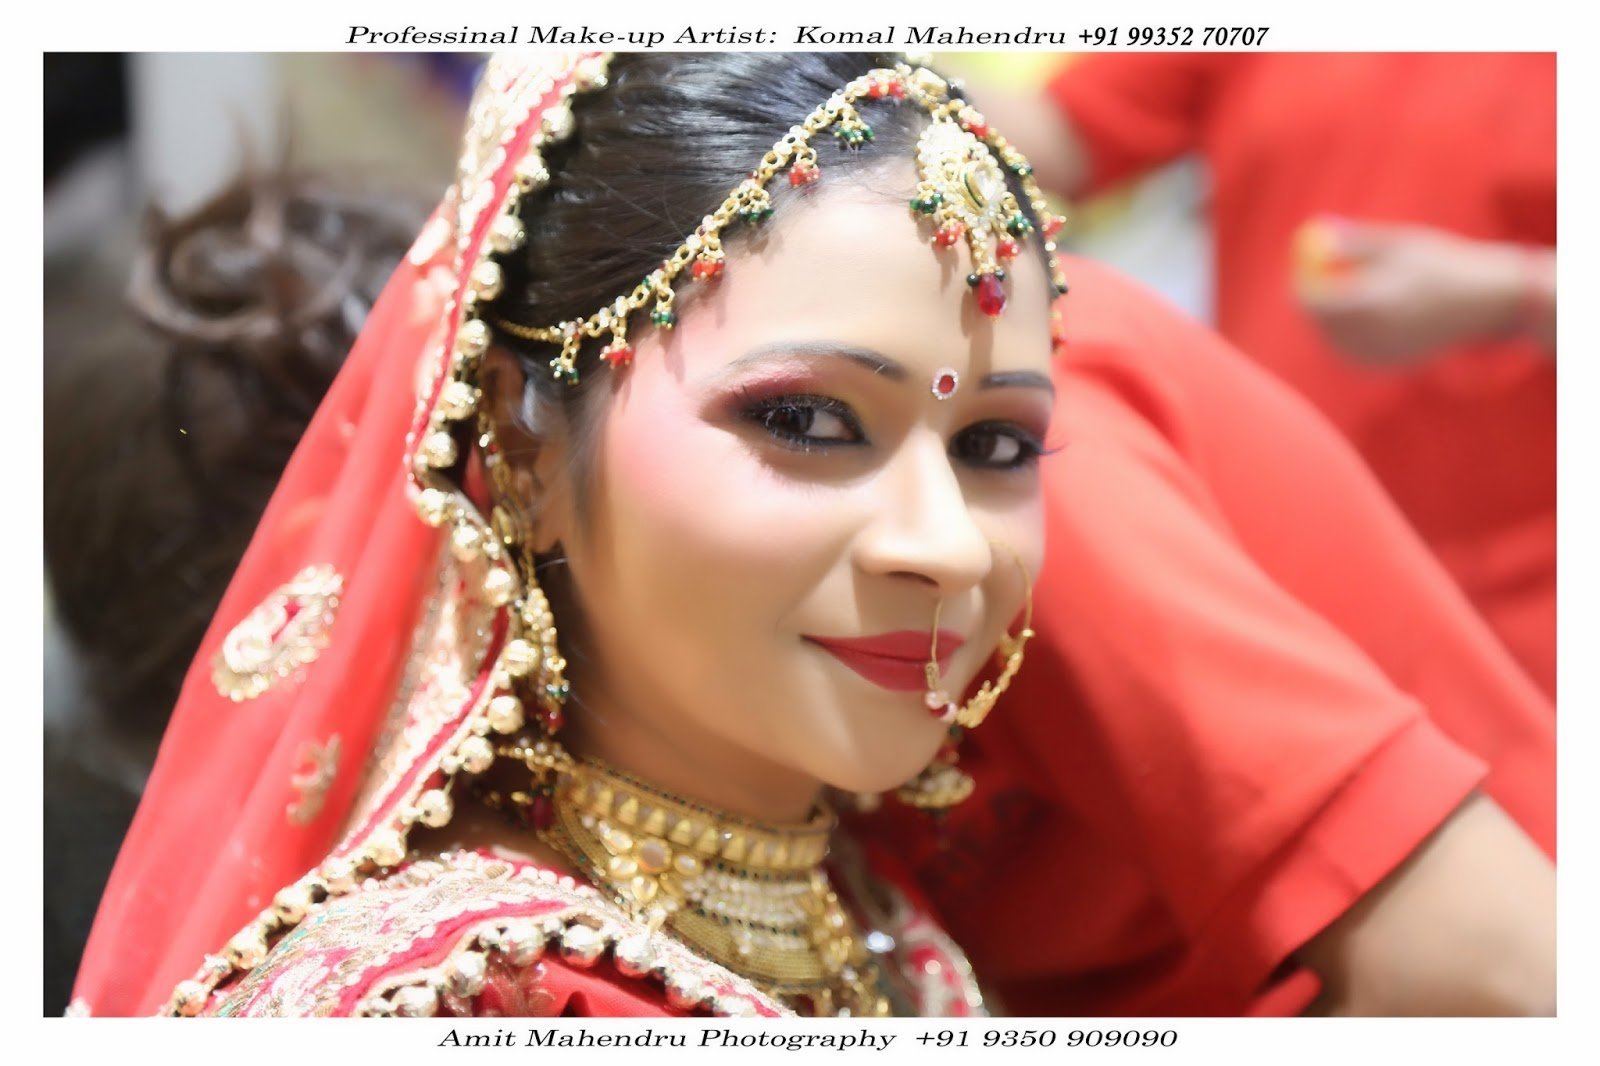 Komal mahendru s professional makeup lucknow india bridal makeup - Best Bridal Makeup Artist In Lucknow Https Www Facebook Com Komal Mahendru